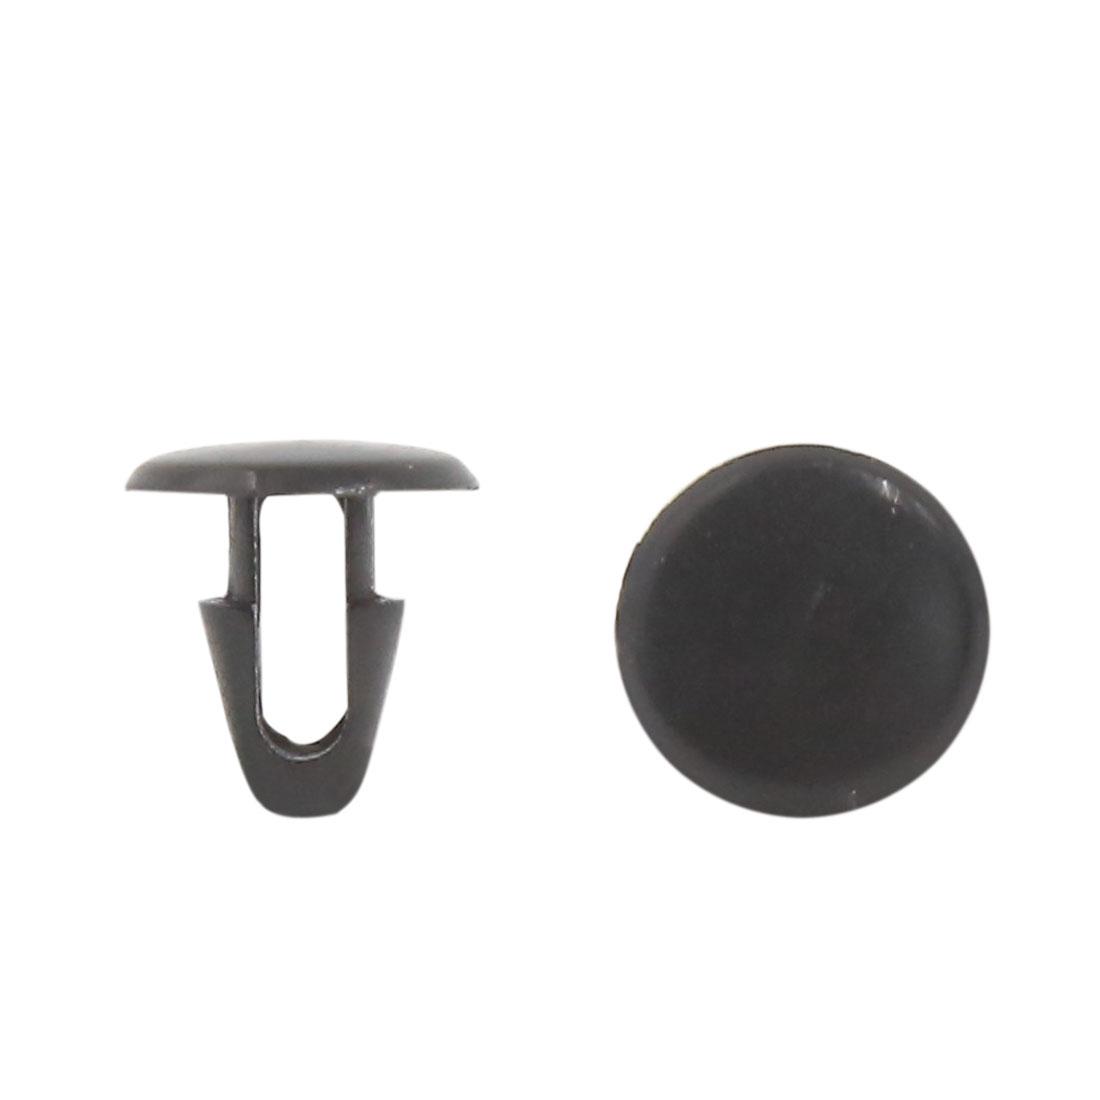 50Pcs 7.5mm Hole Black Plastic Push in Rivet Interior Trim Panel Car Door Clips